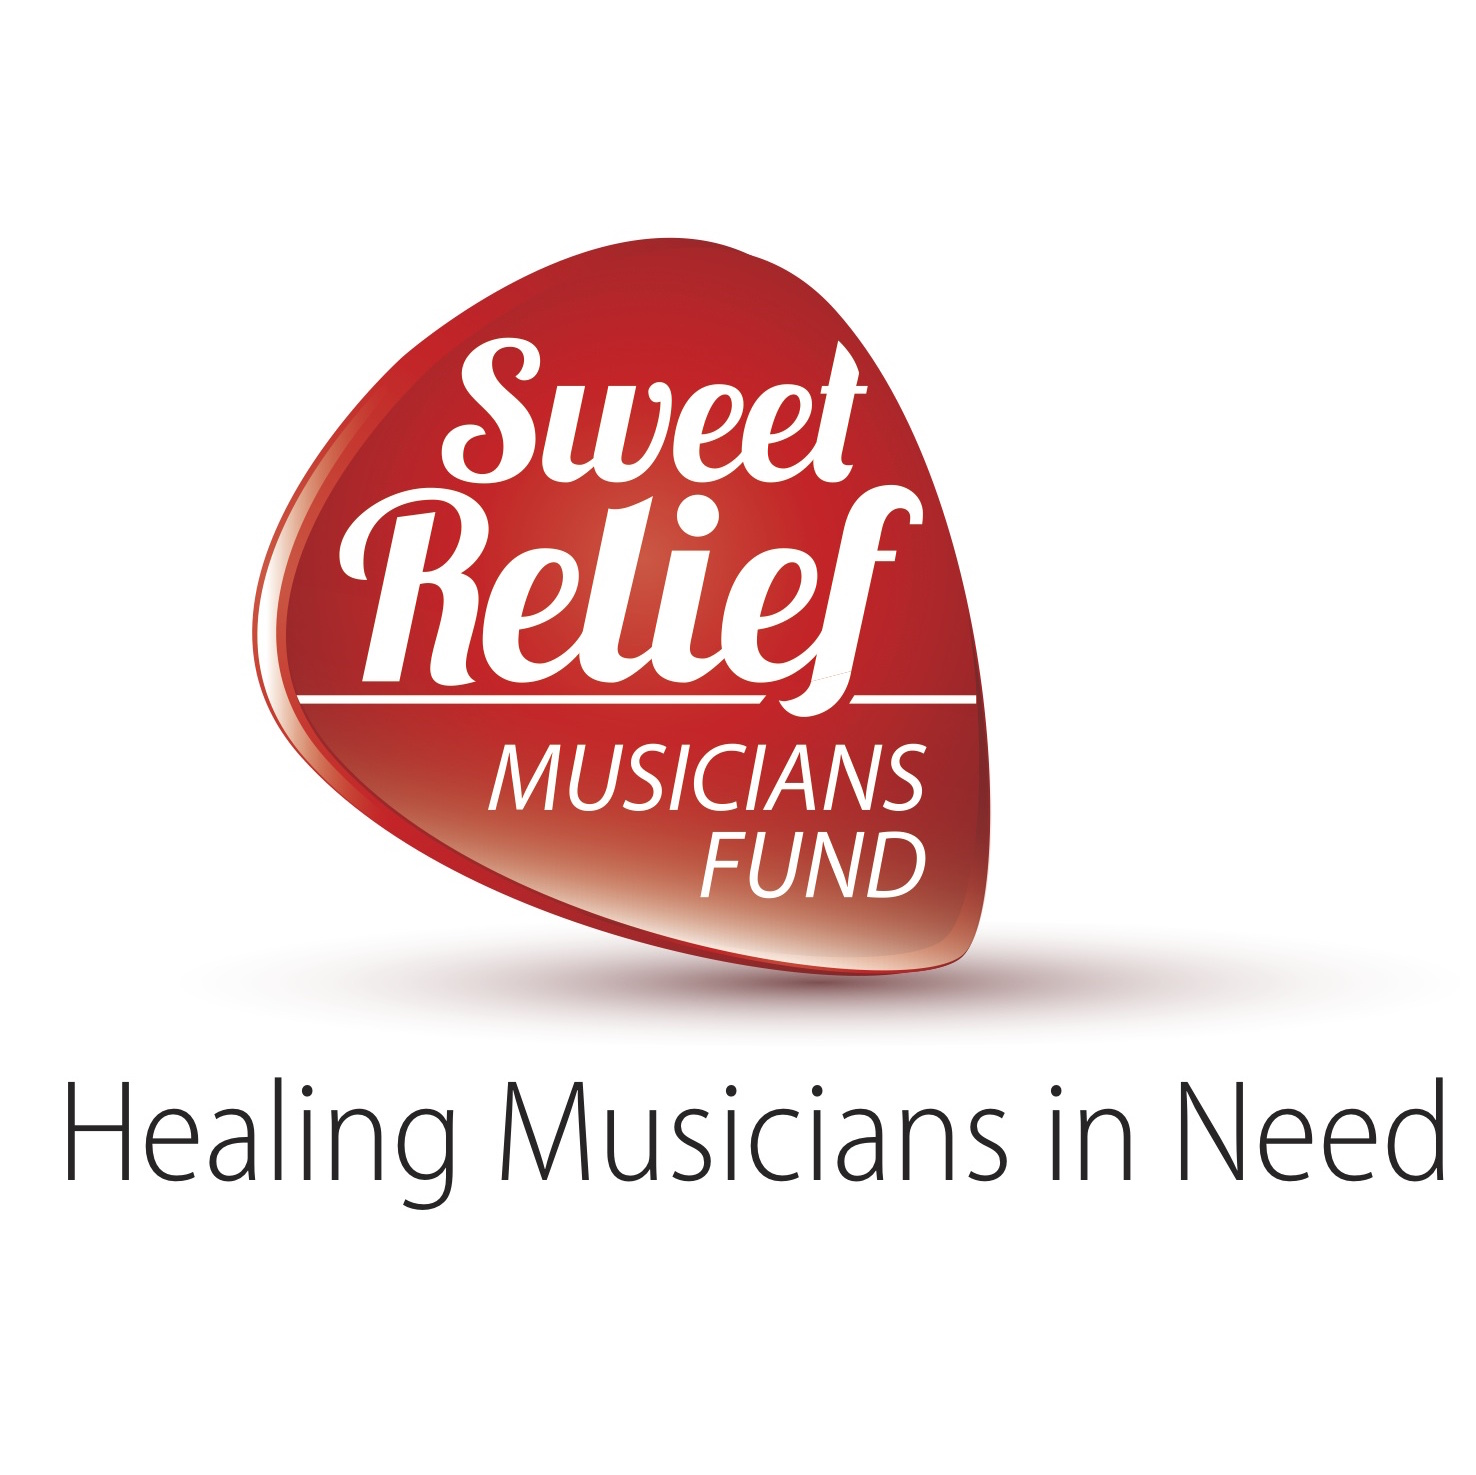 Sweet Relief Musicians Fund